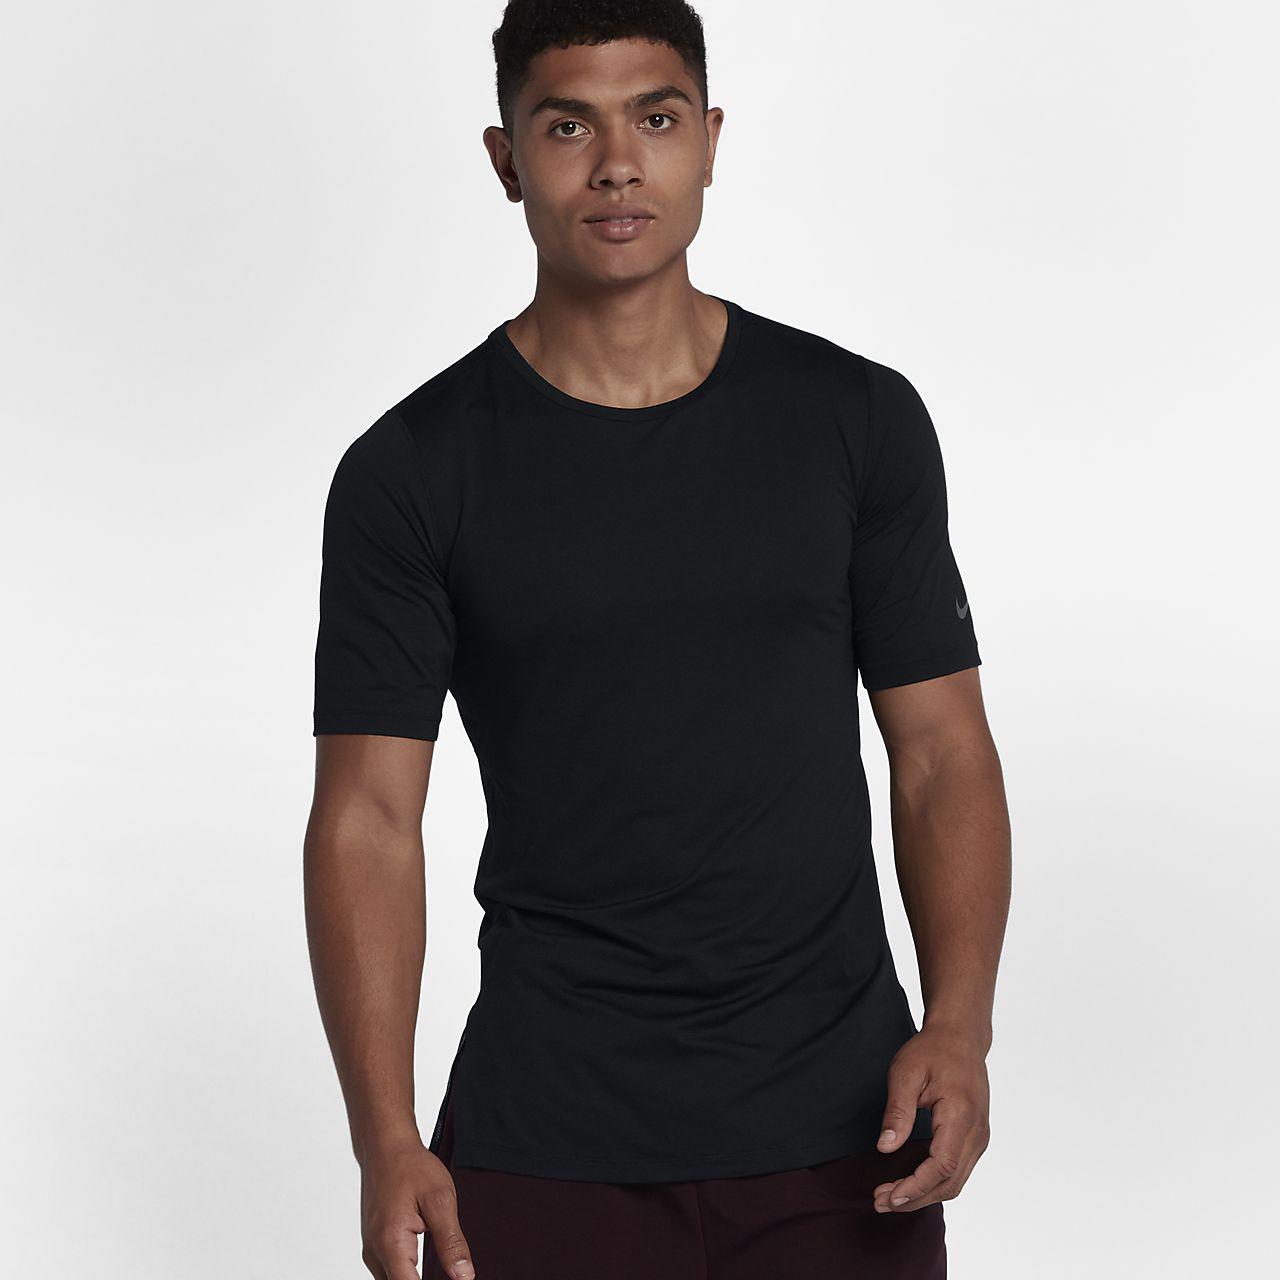 026d1525 Nike Dri-FIT Men's Utility Short-Sleeve Training Top. Nike.com LU